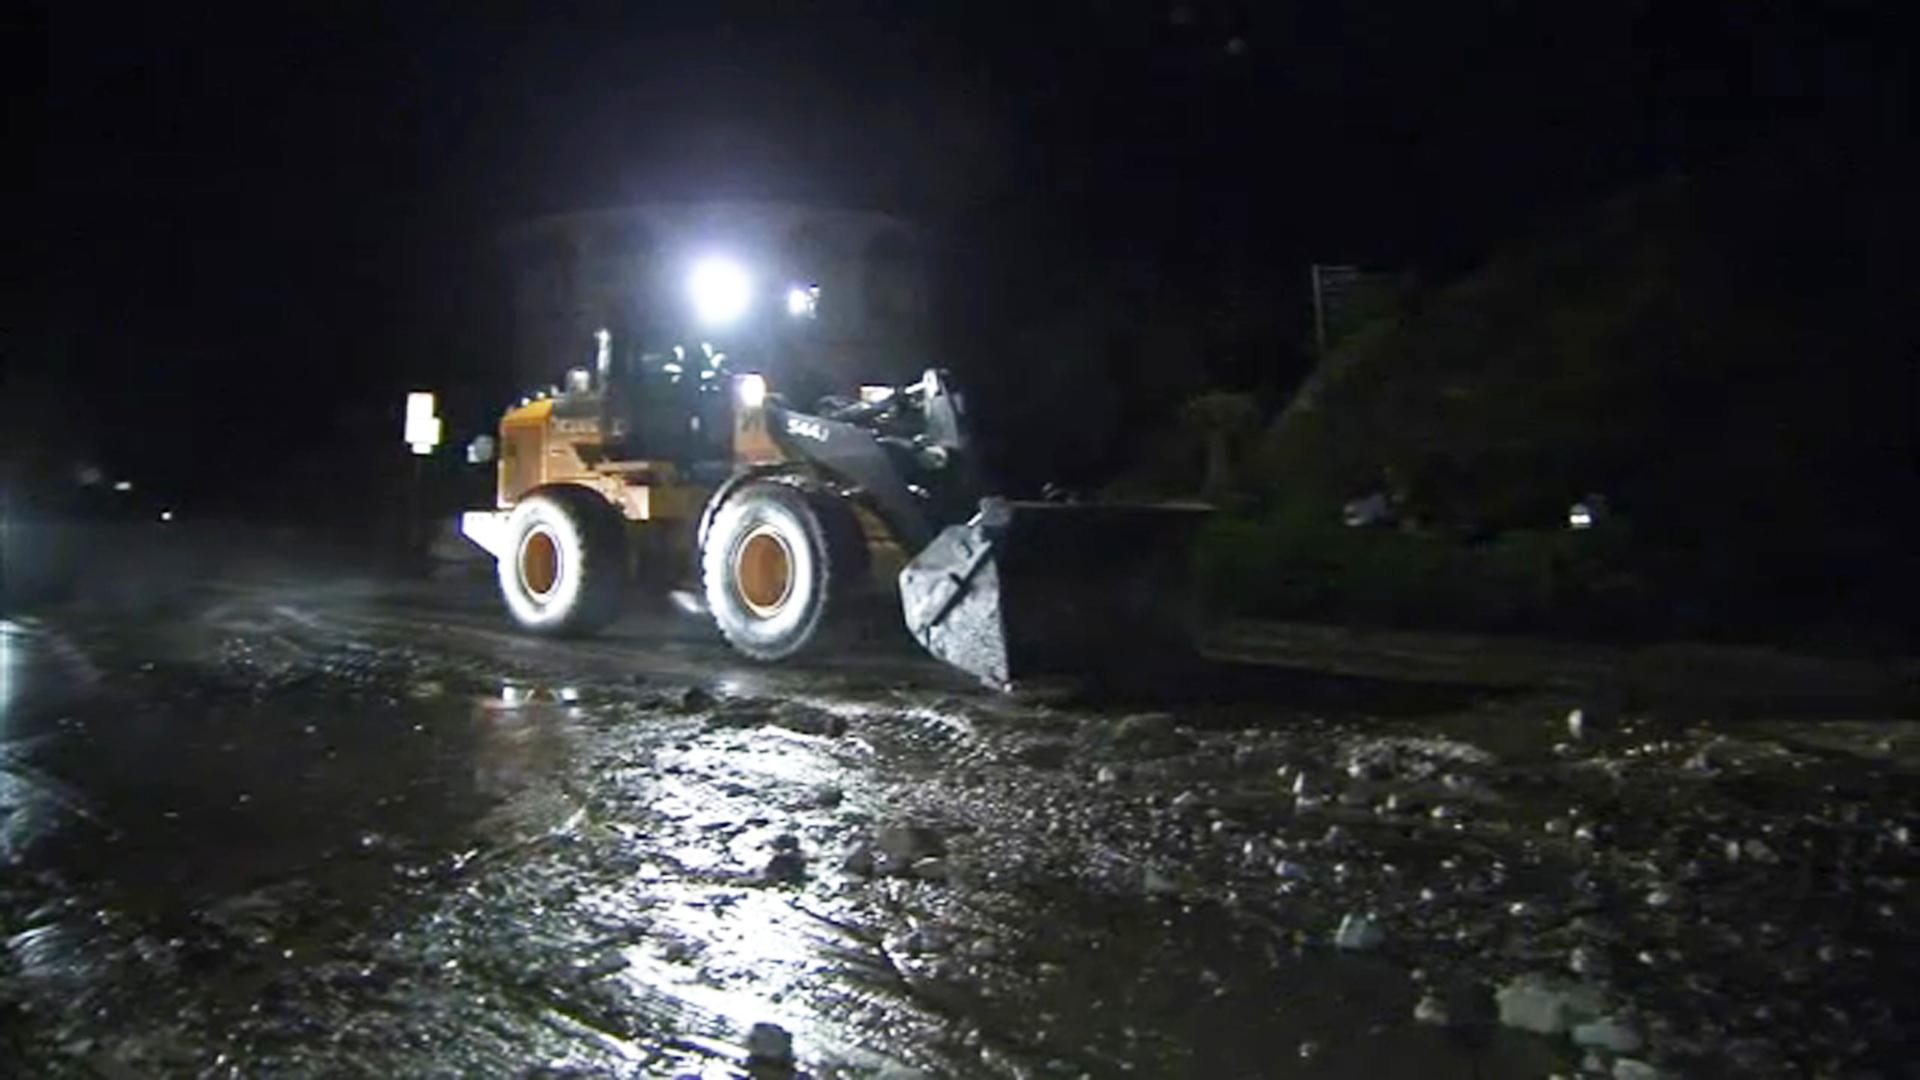 La Tuna Canyon Road reopens after rocks, debris shut it down overnight